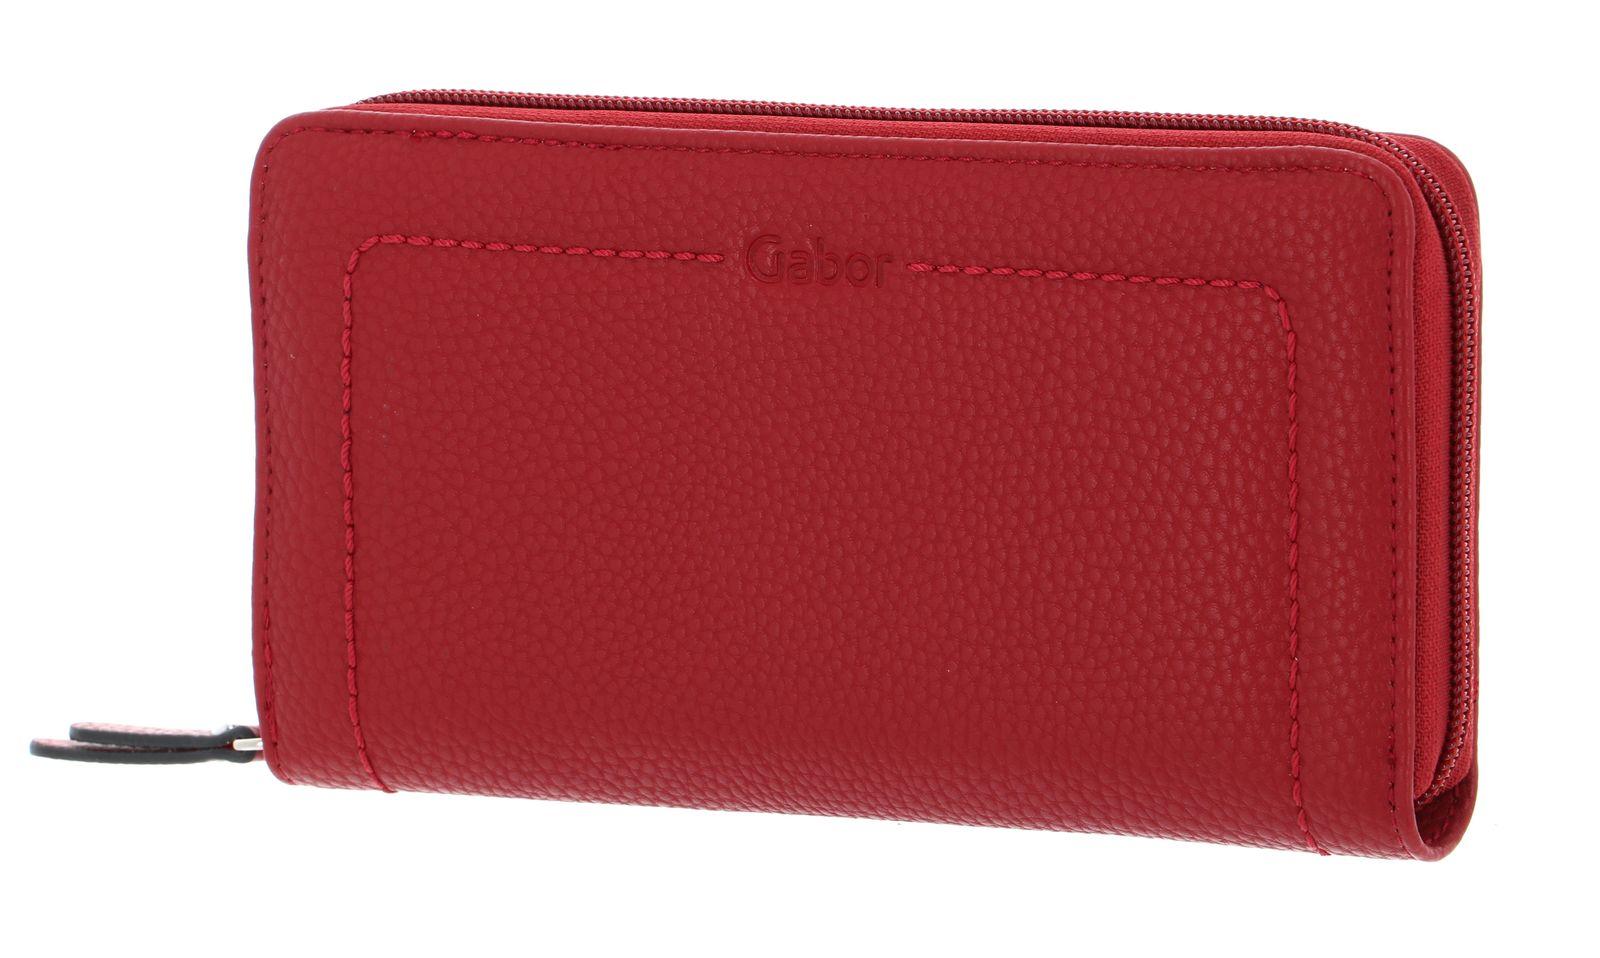 Gabor Alanna Long Zip Wallet Red